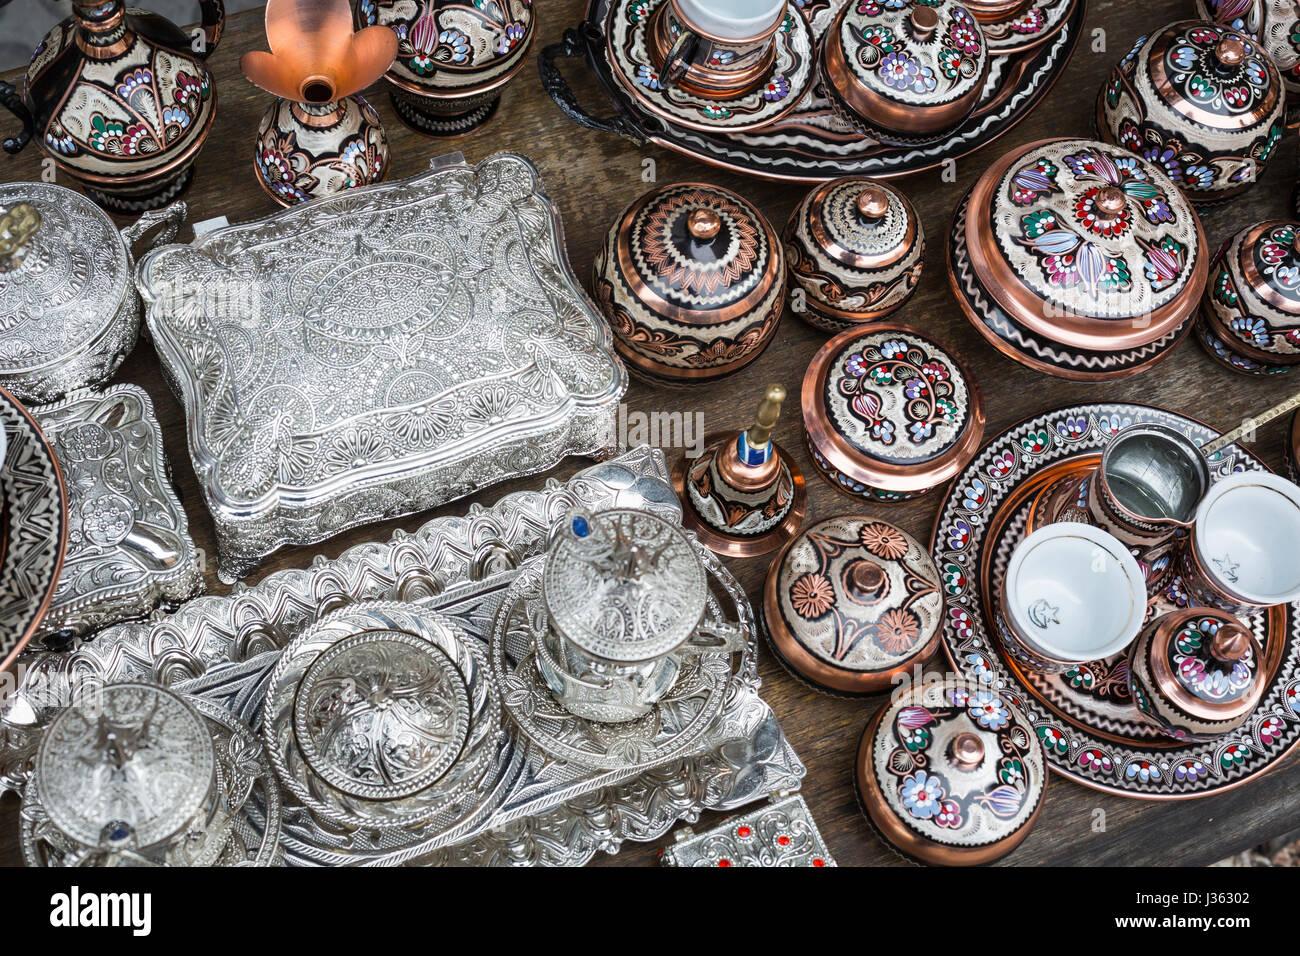 Artigianali tradizionali caffè rame pentole in negozi di souvenir a Sarajevo. La Bosnia ed Erzegovina. Foto Stock